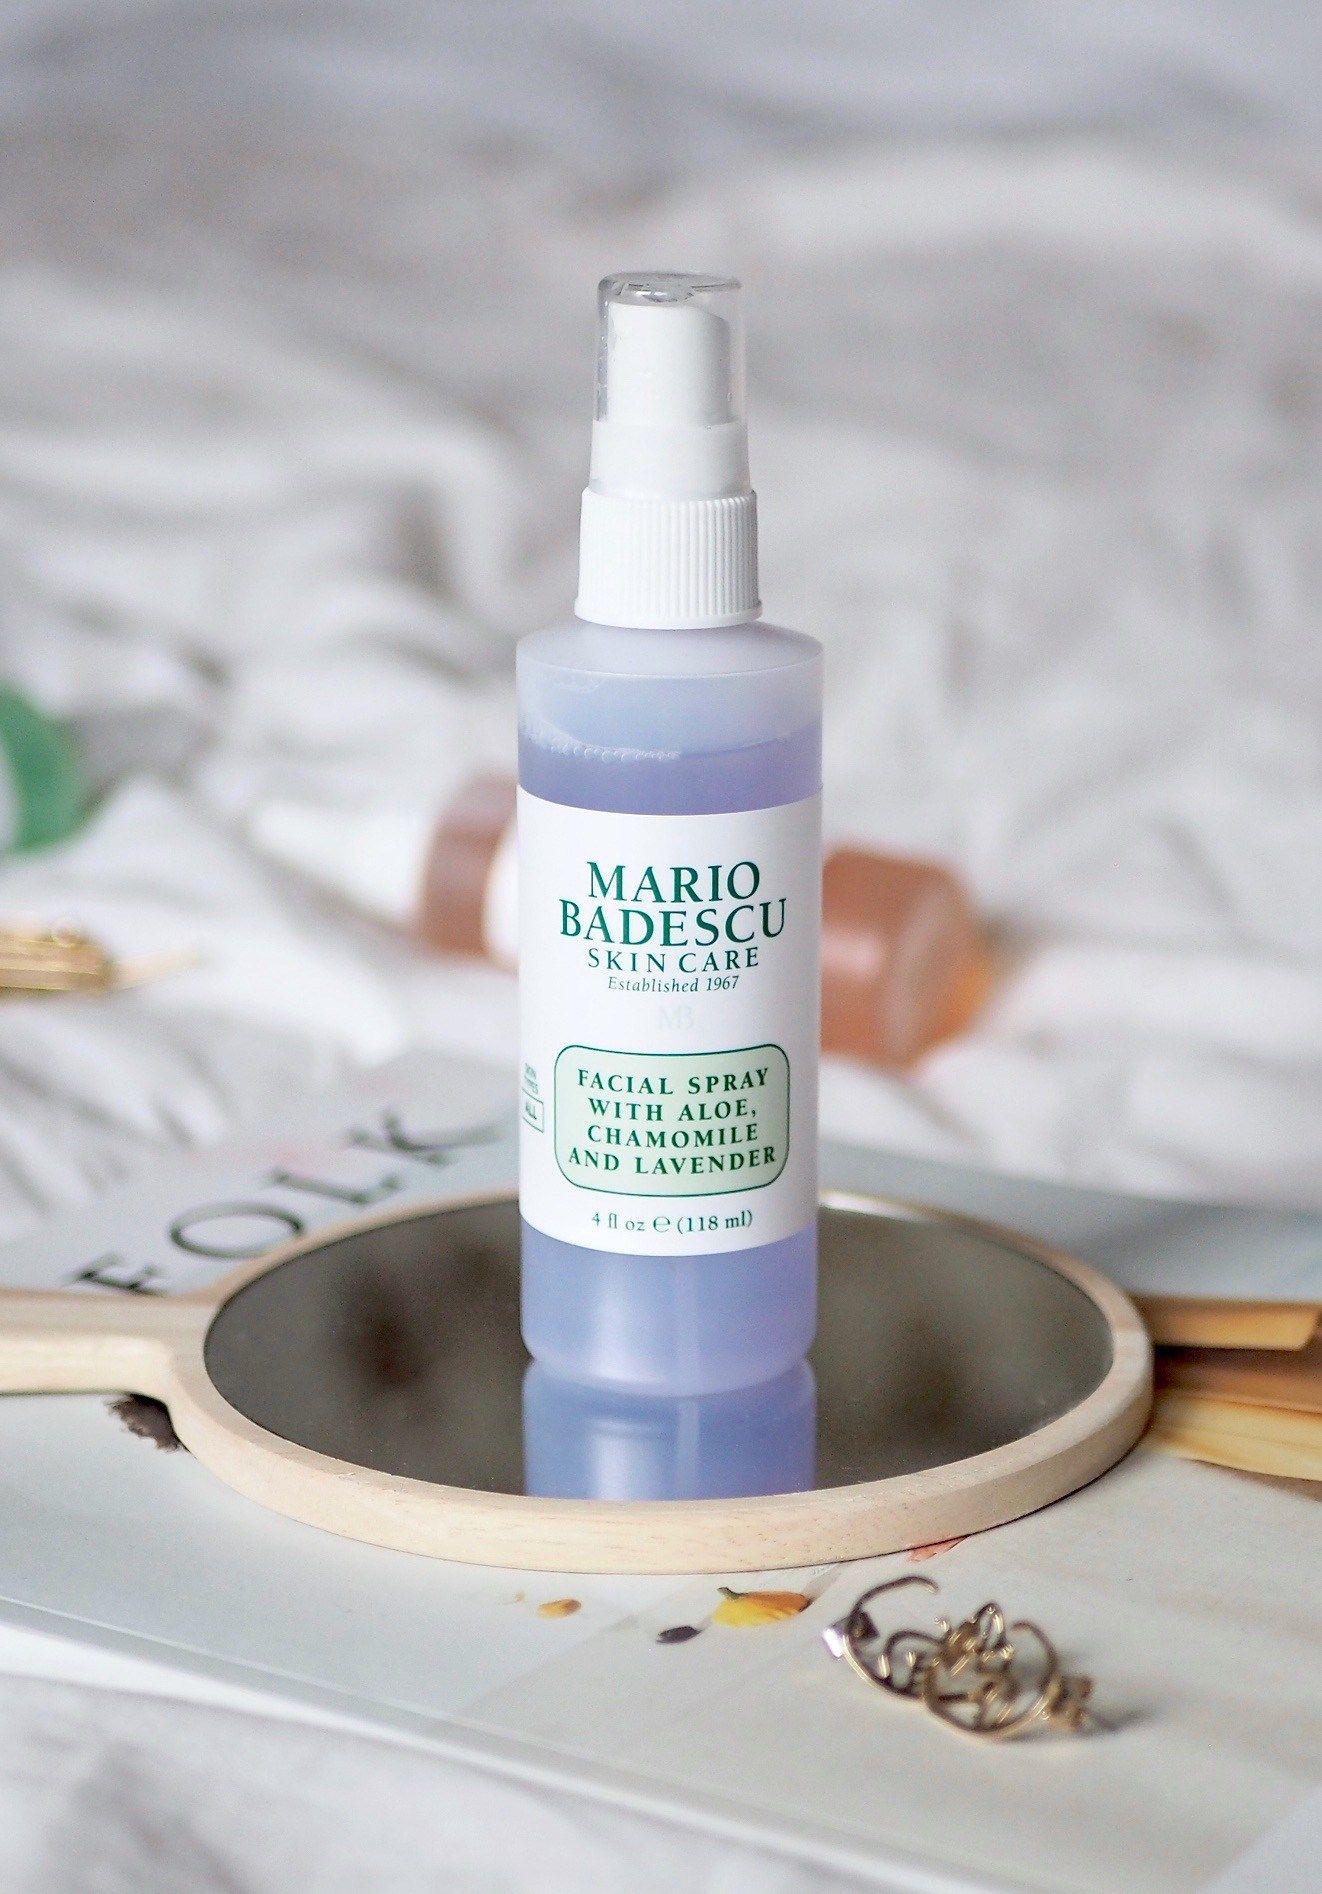 Mario Badescu Facial Spray Makeup Products Skin Care